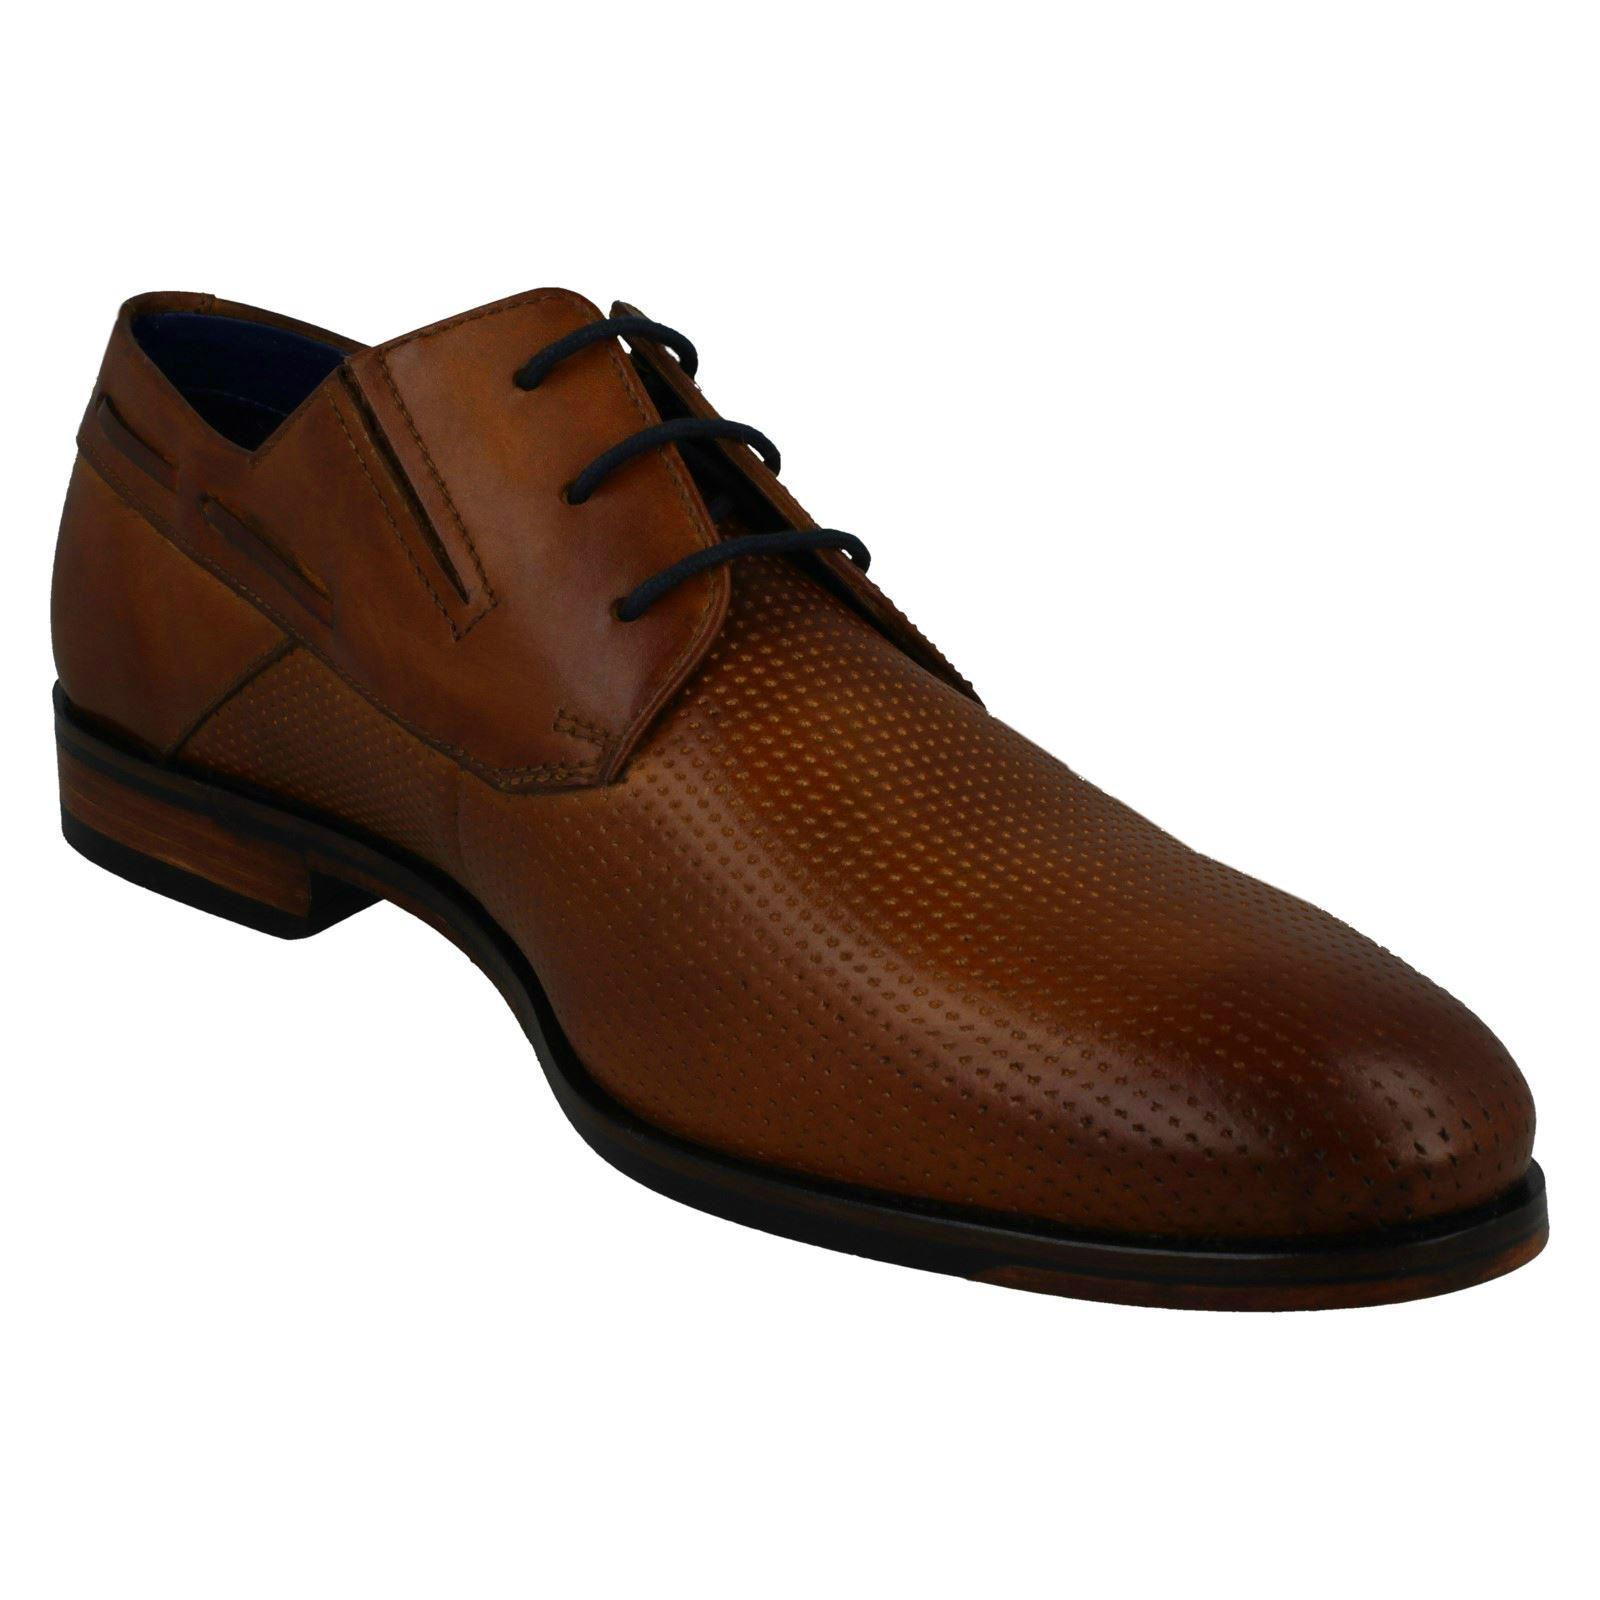 Mens Bugatti Formal Shoes '311-67703-1100'   eBay